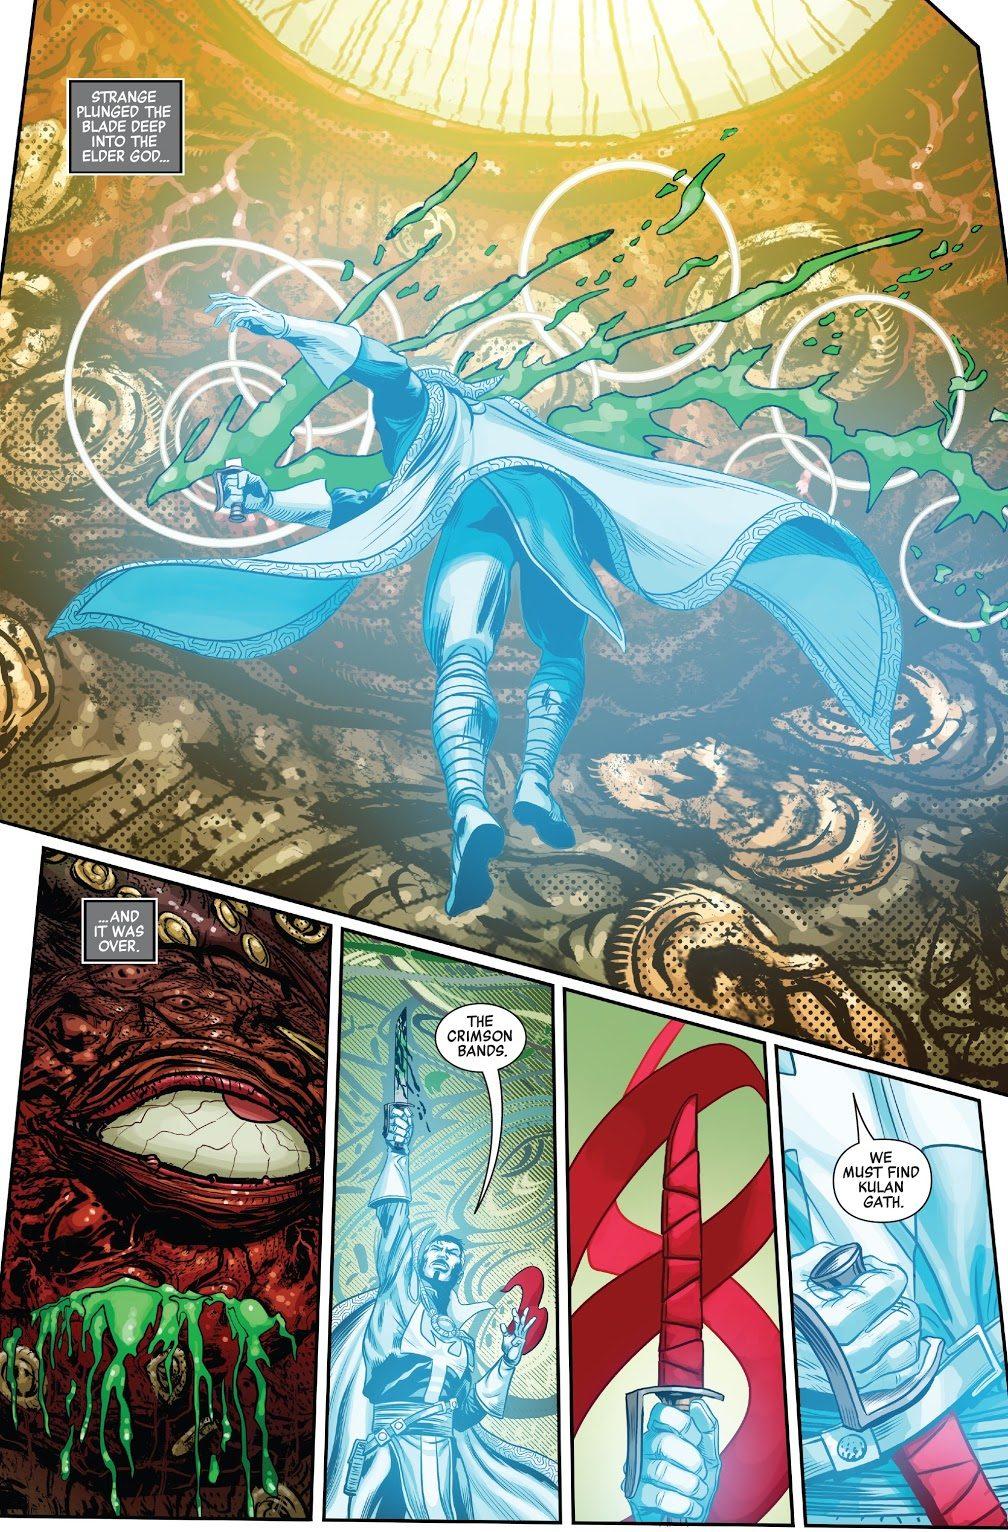 Doctor Strange Kills Shuma-Gorath